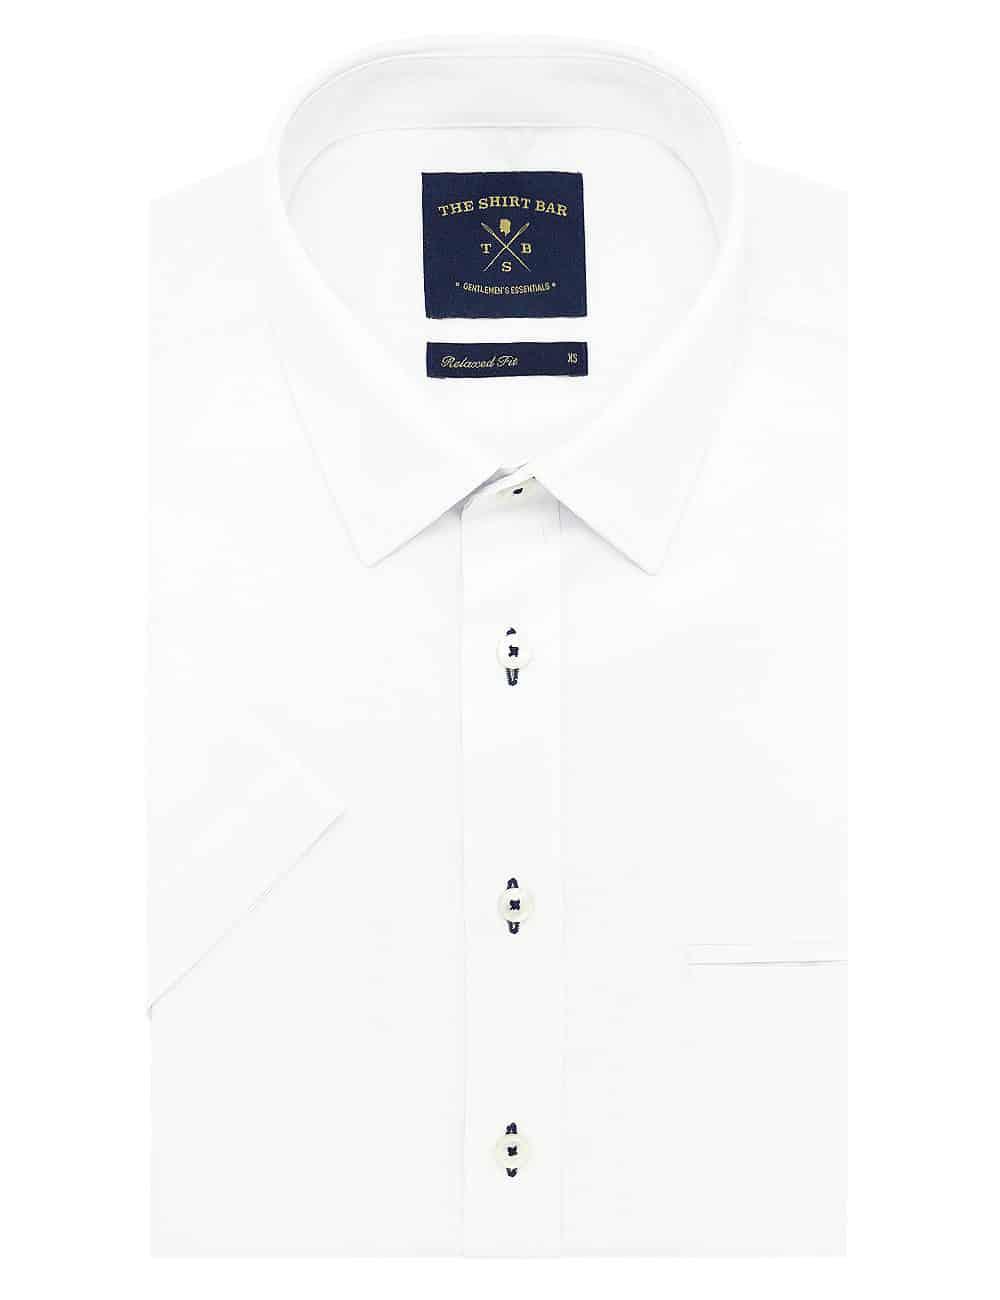 RF Solid White Poplin Eco-ol Bamboo Blend Wrinkle Free Short Sleeve Shirt RF9SNB1.15